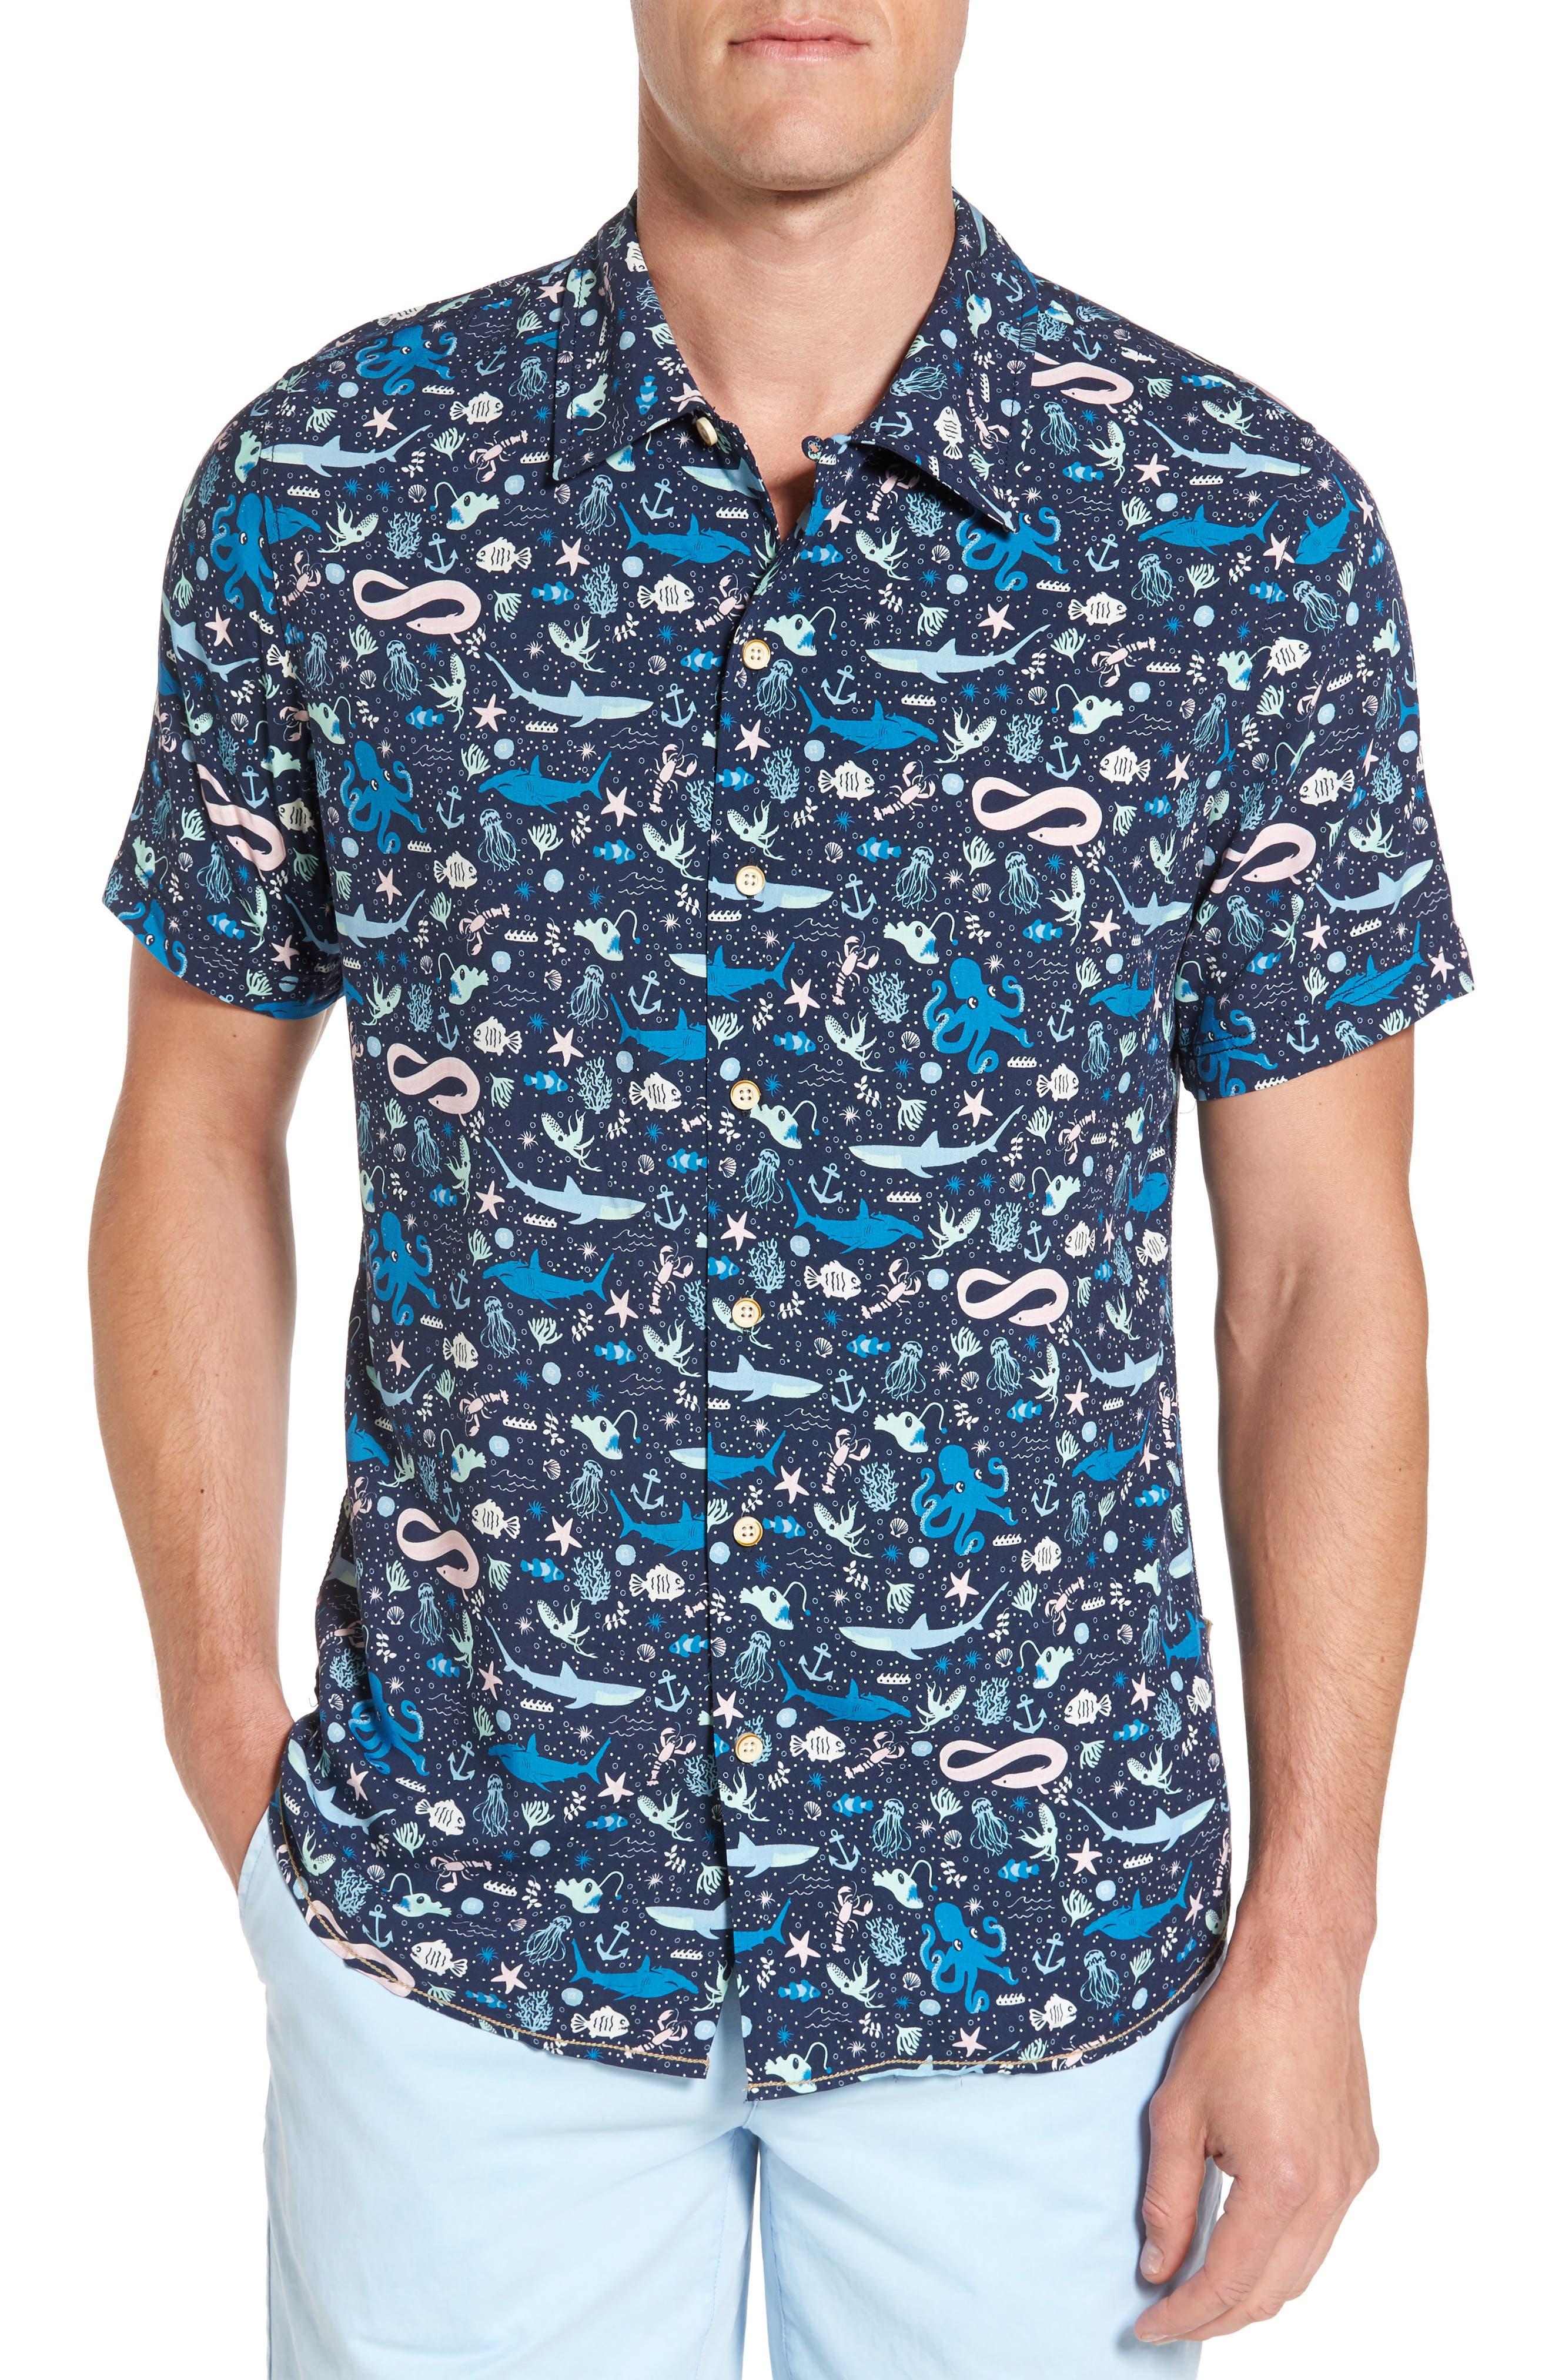 Surfside Supply Fish Print Rayon Shirt